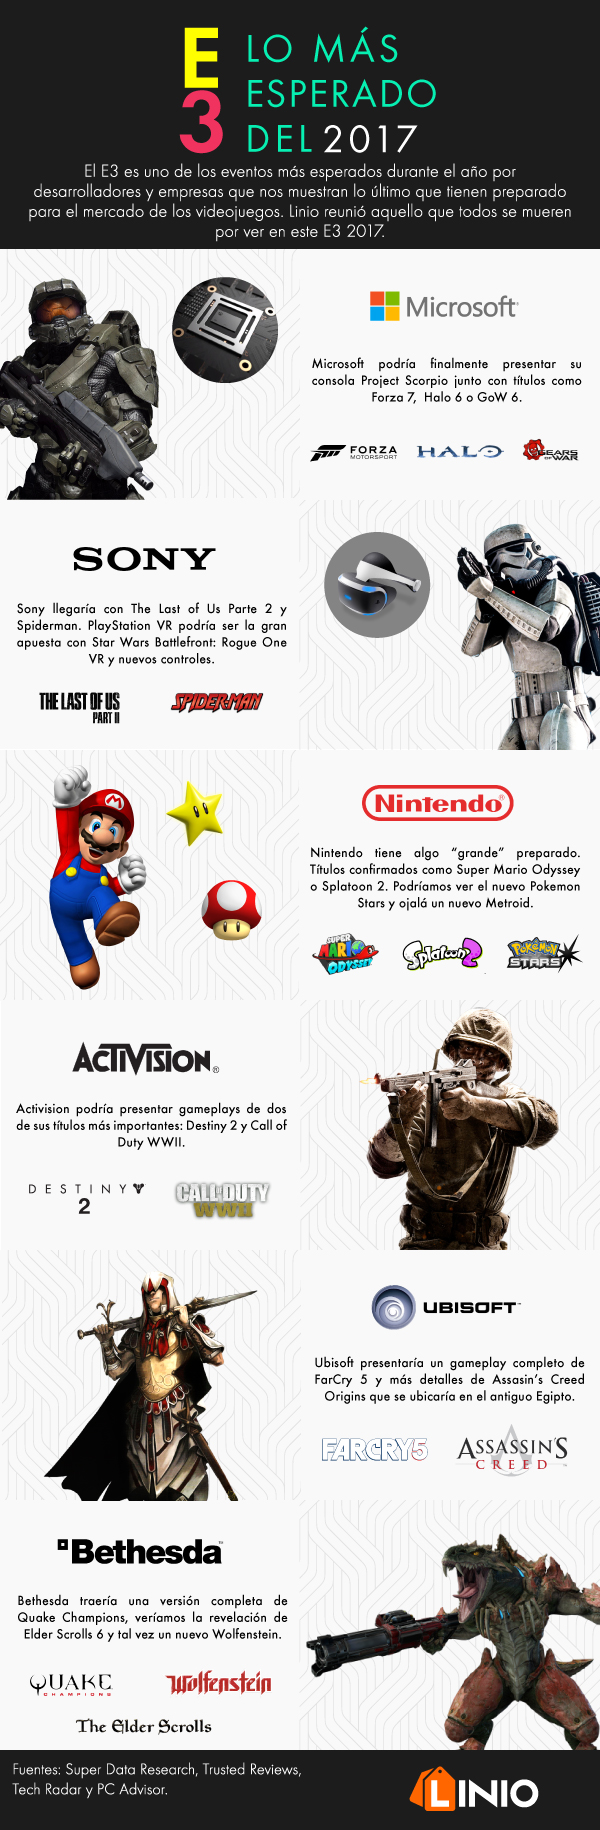 Infografía: Lo más esperado del E3 2017 - e3_2017_info